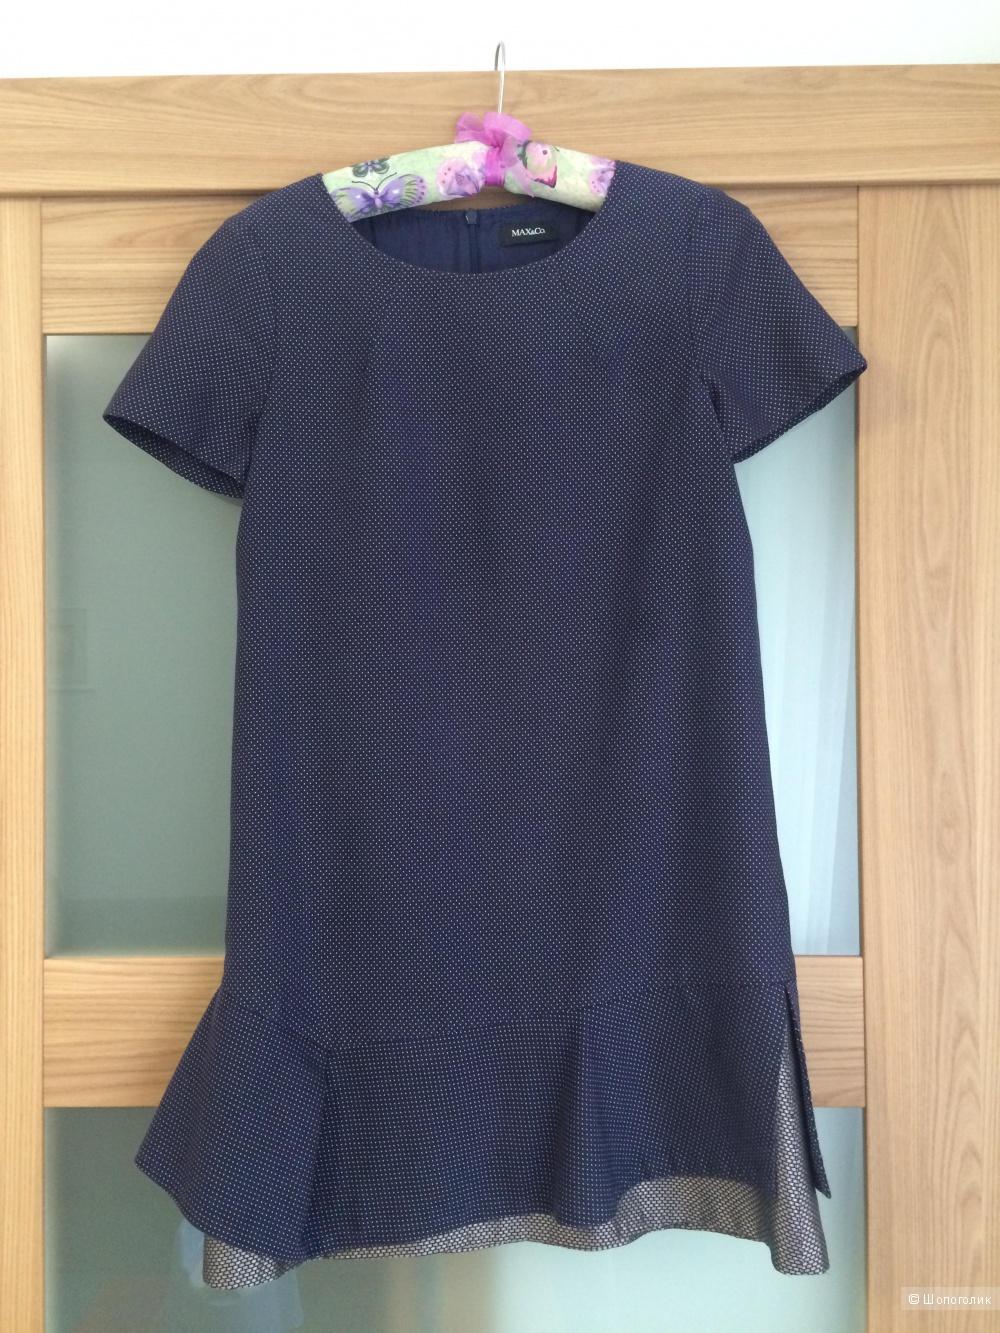 Платье Max&co, оригинал, размер US 2